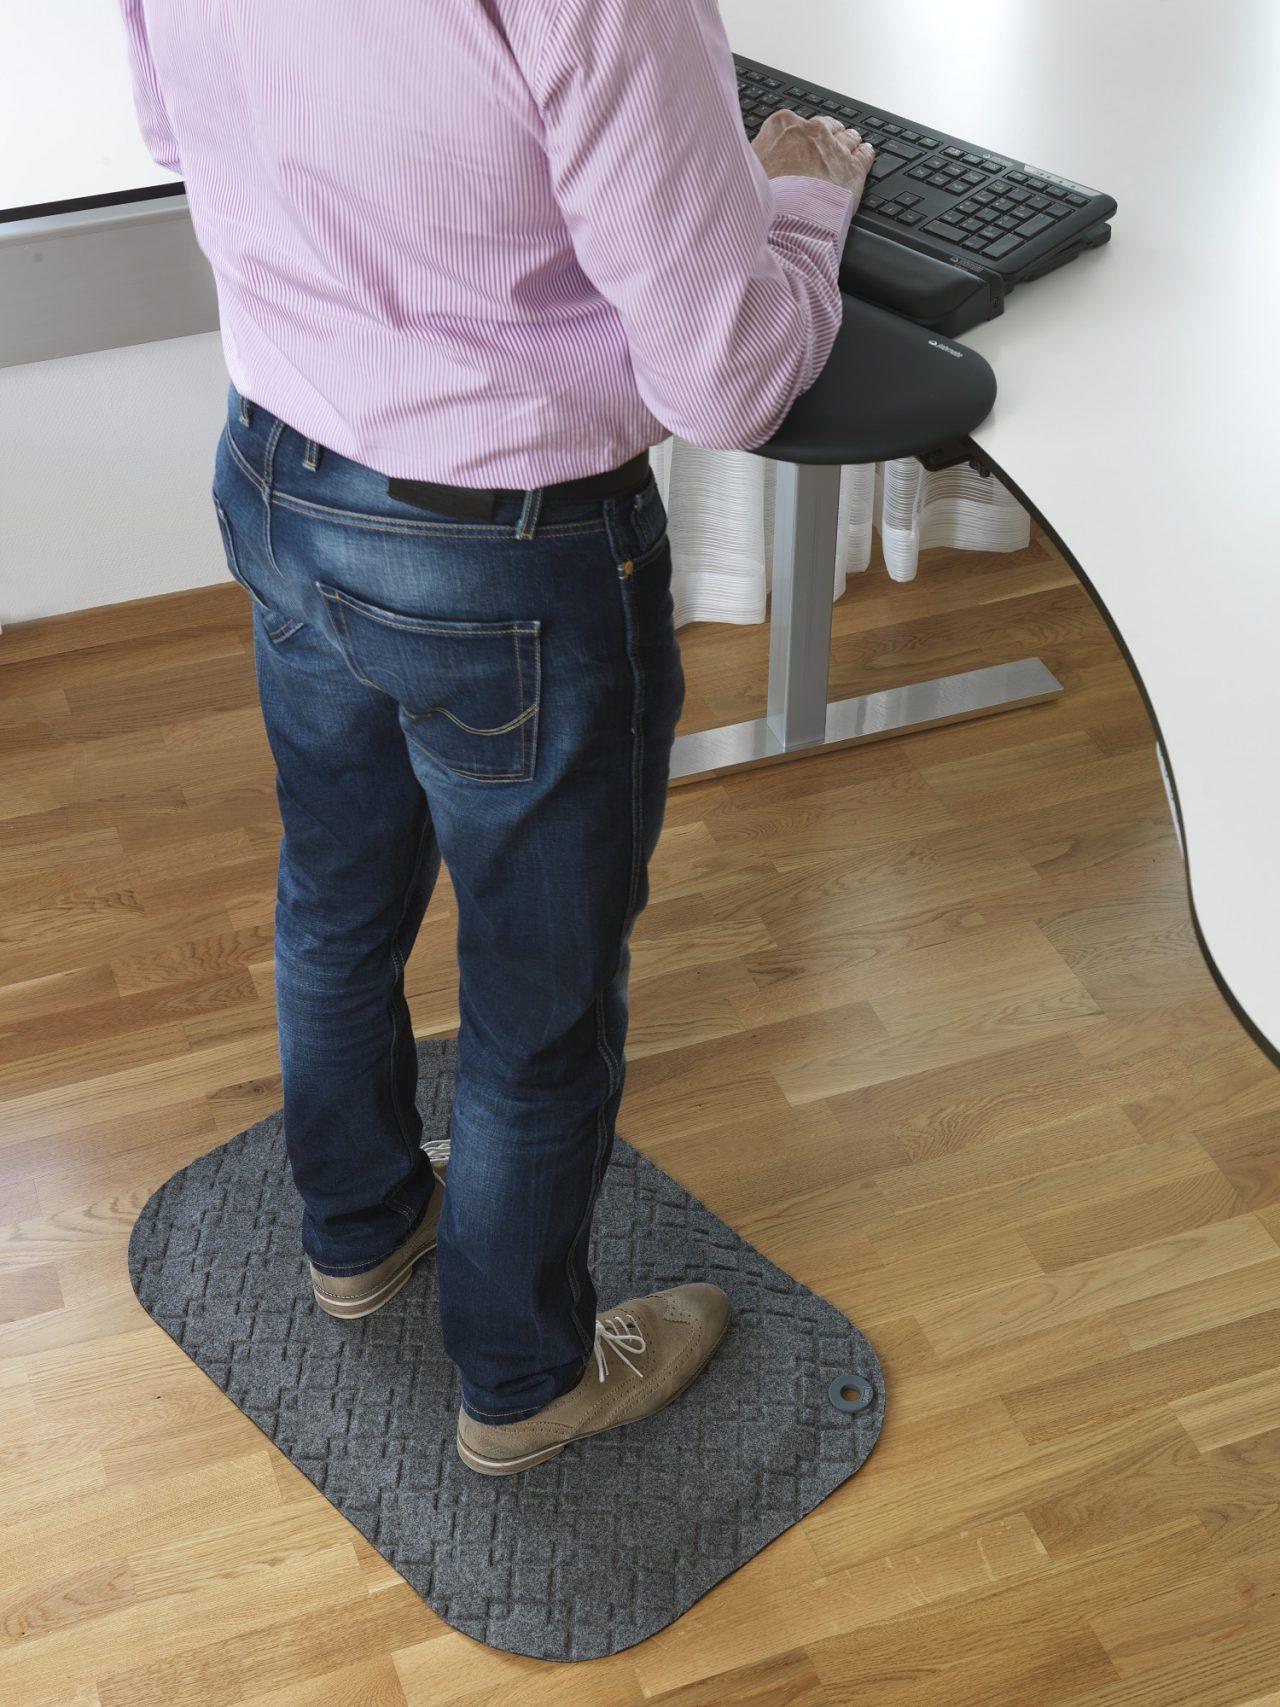 StandUp ergonomisk måtte 2